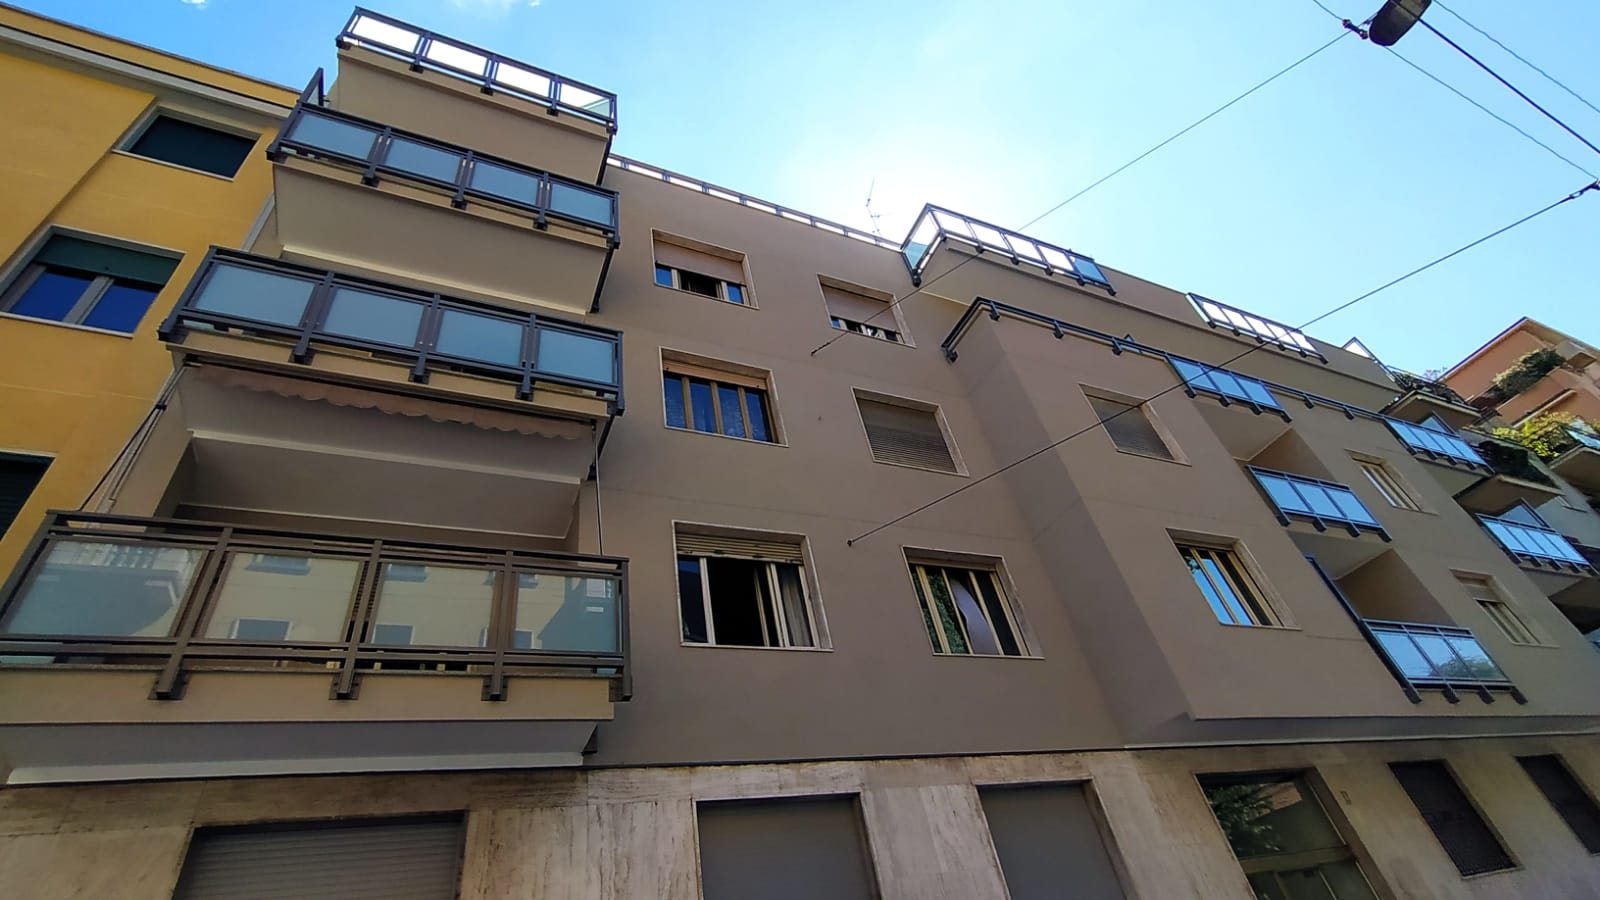 VIA SANFELICE 8 - Milano